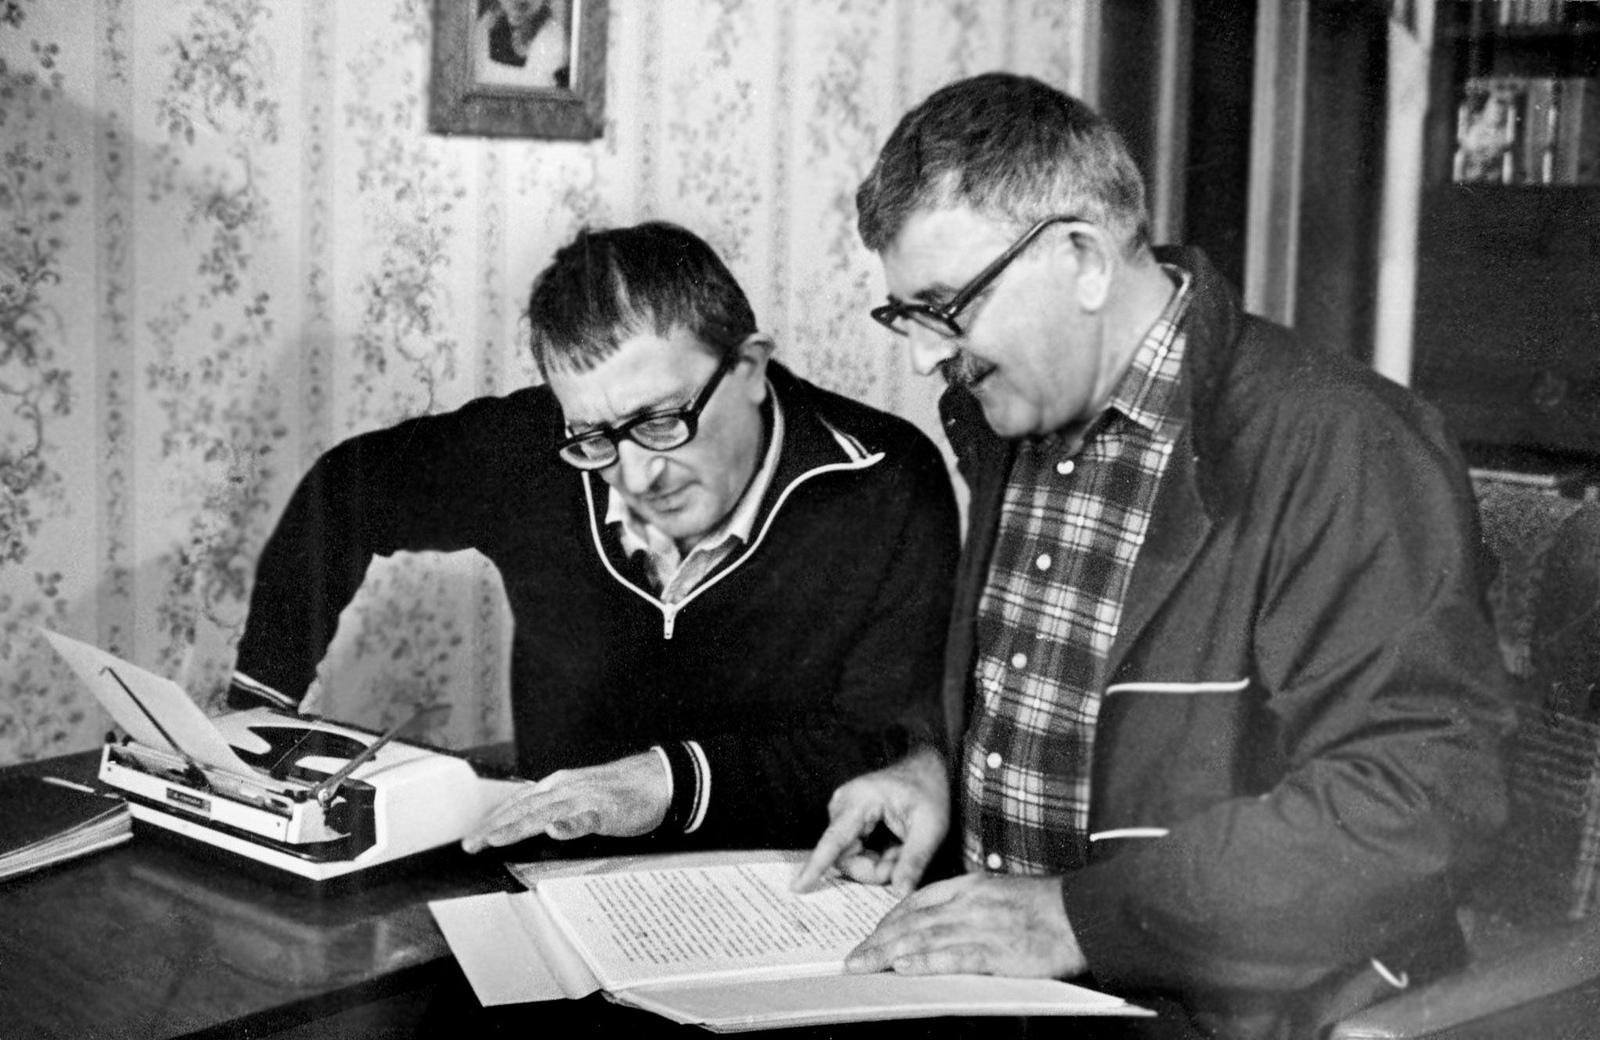 Борис (слева) и Аркадий (справа) Стругацкие